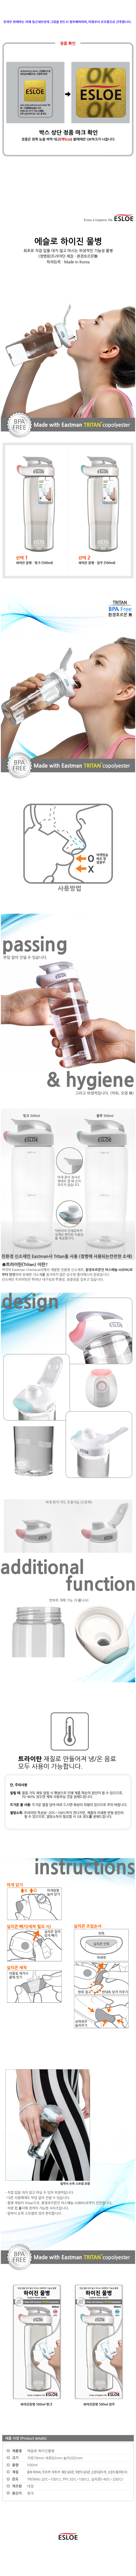 hygiene_500ml_detail_Korean_(jpg)